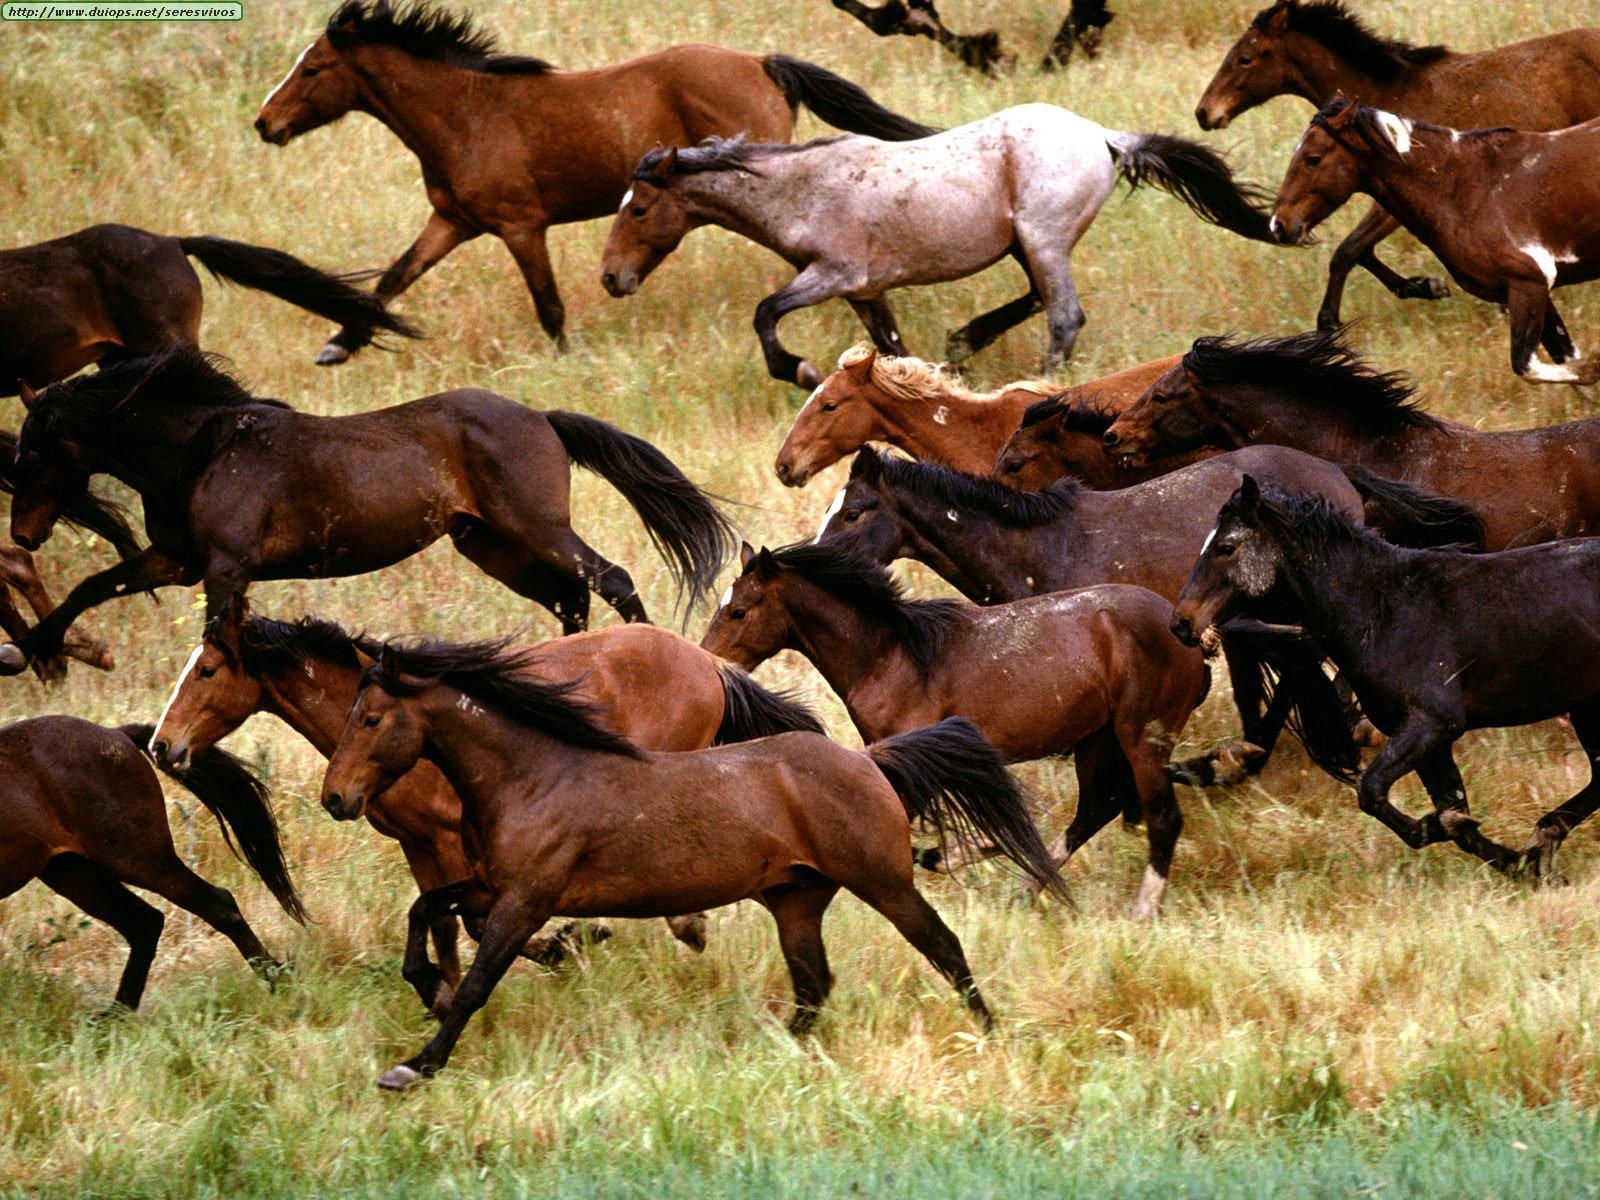 heard of horses